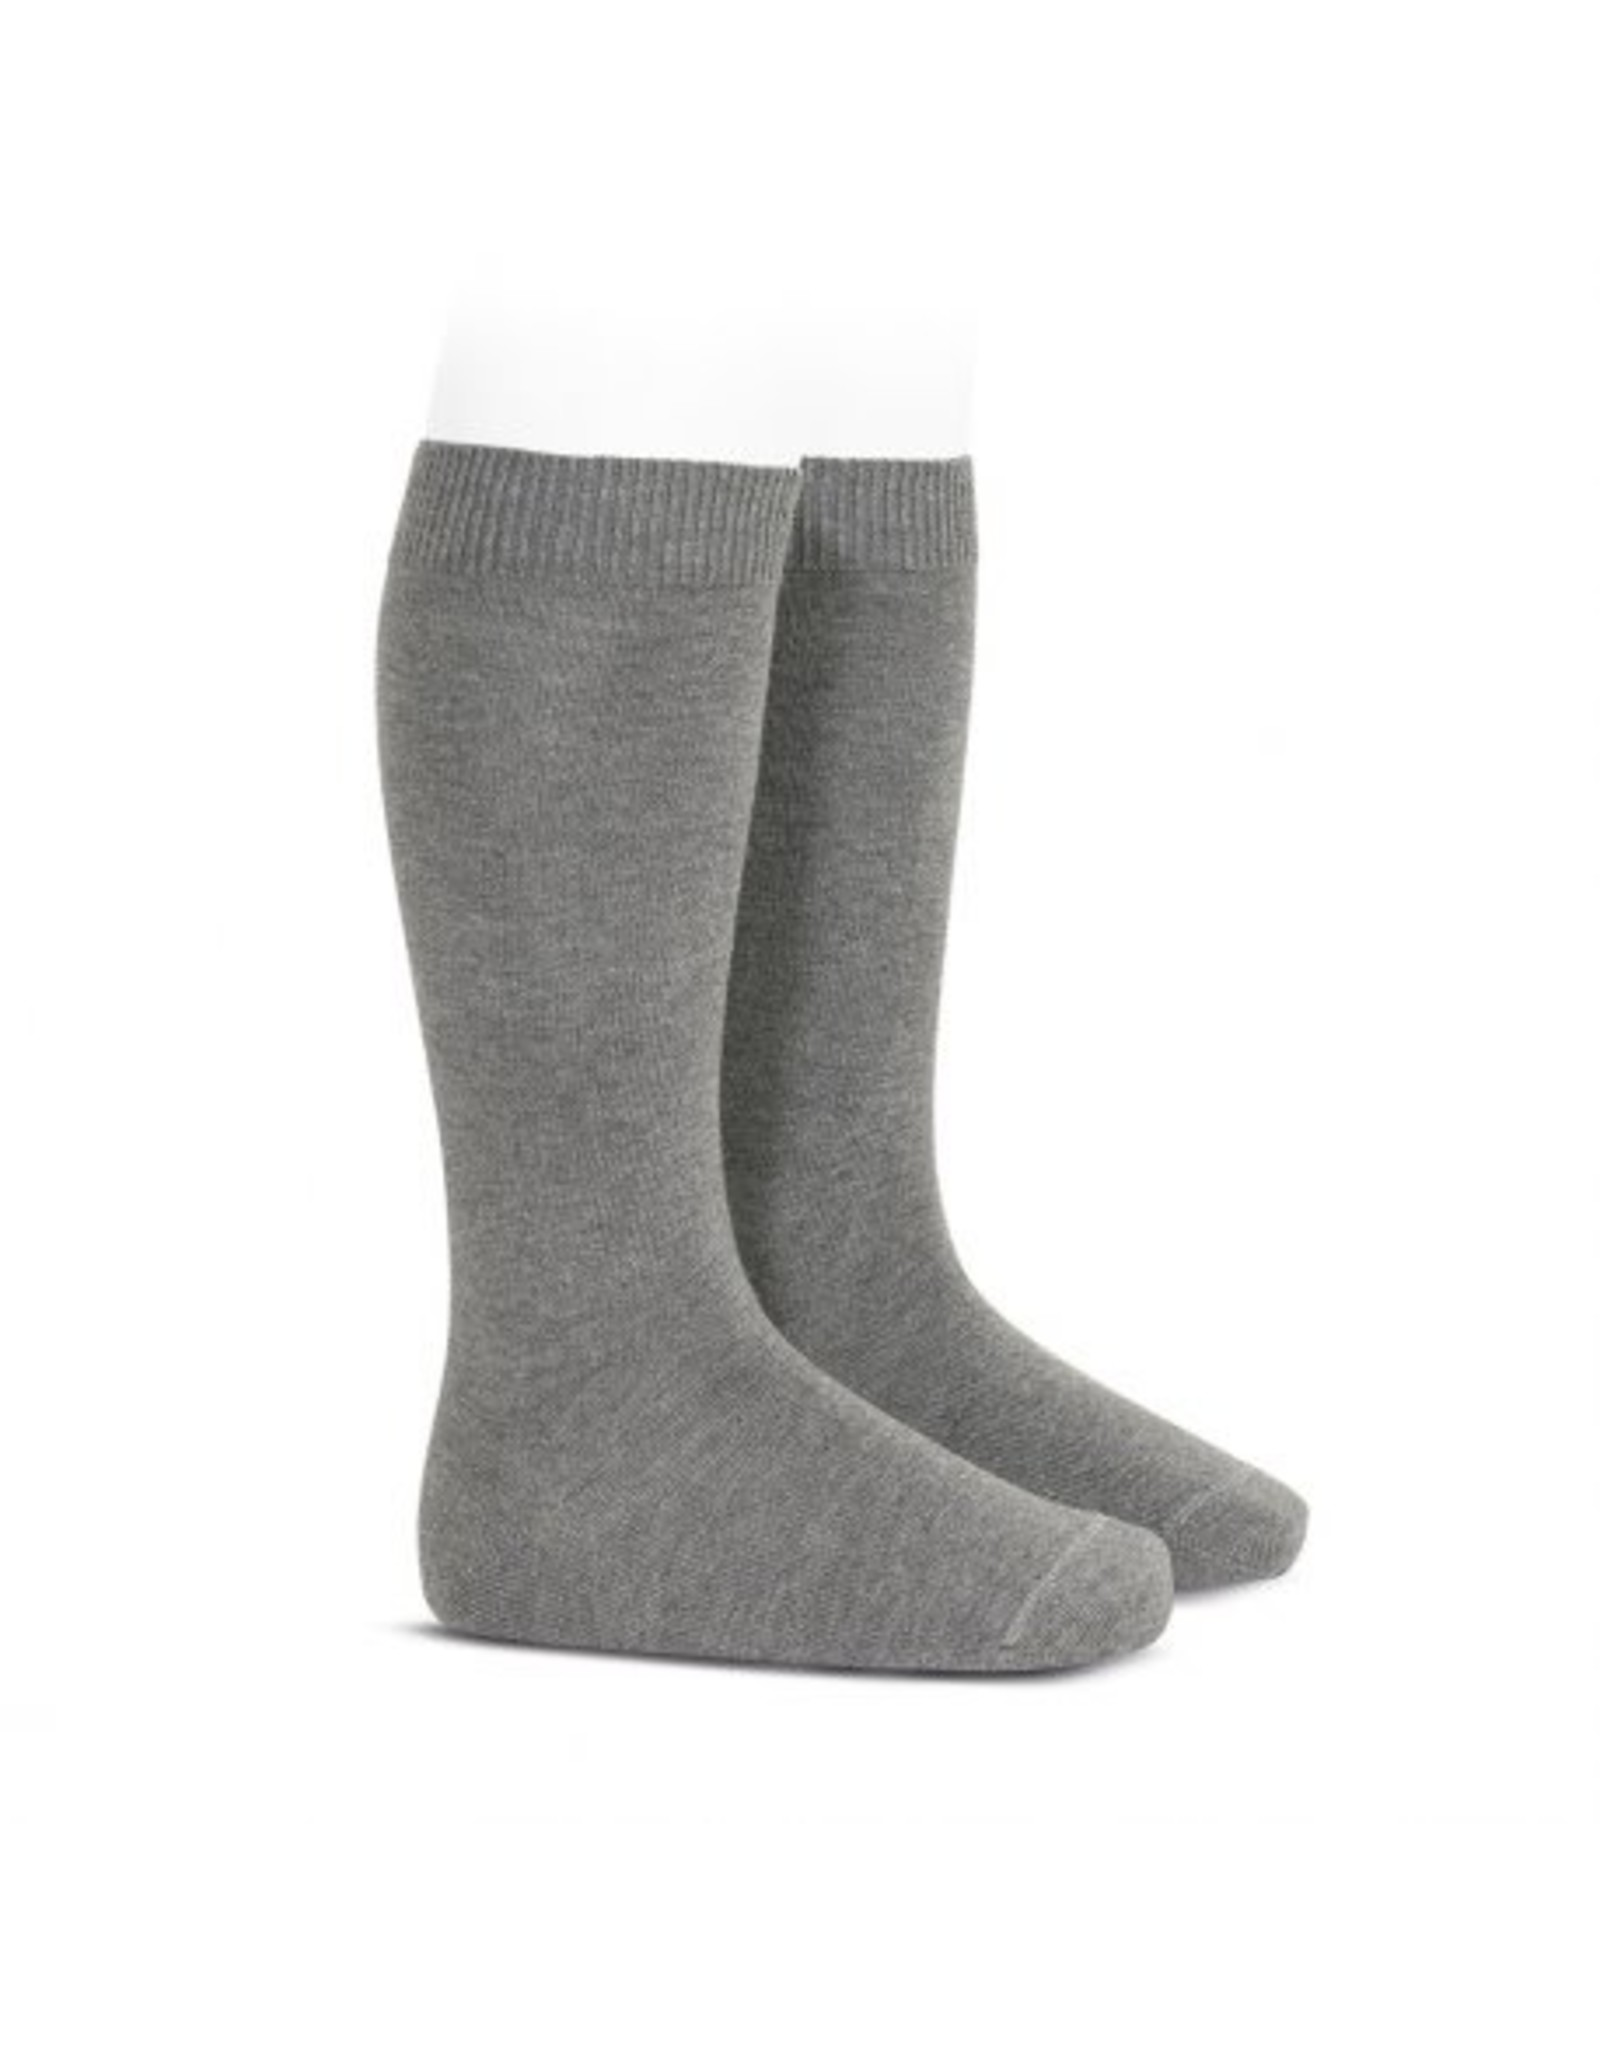 CONDOR Light Grey Plain Knee High Socks